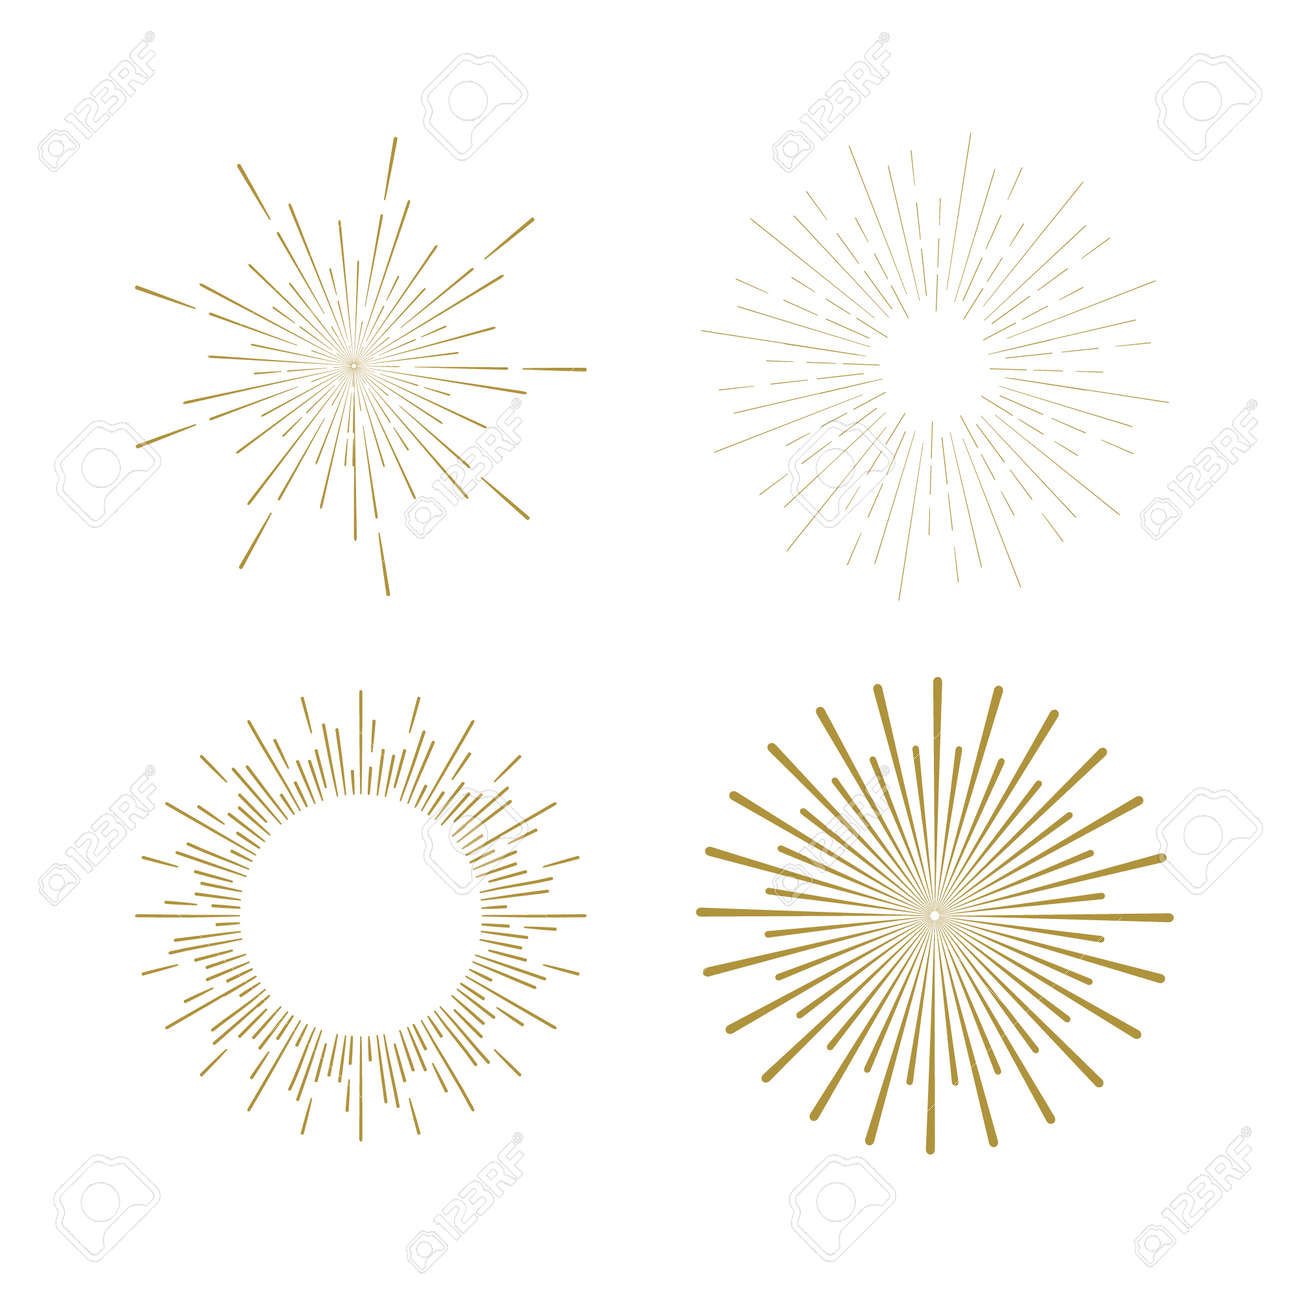 Retro Sun burst shapes. Vintage starburst logo, labels, badges. Sunburst minimal logo frames. Vector firework design elements isolated. Sun burst light logo. Minimal vintage gold firework burst. - 54147632